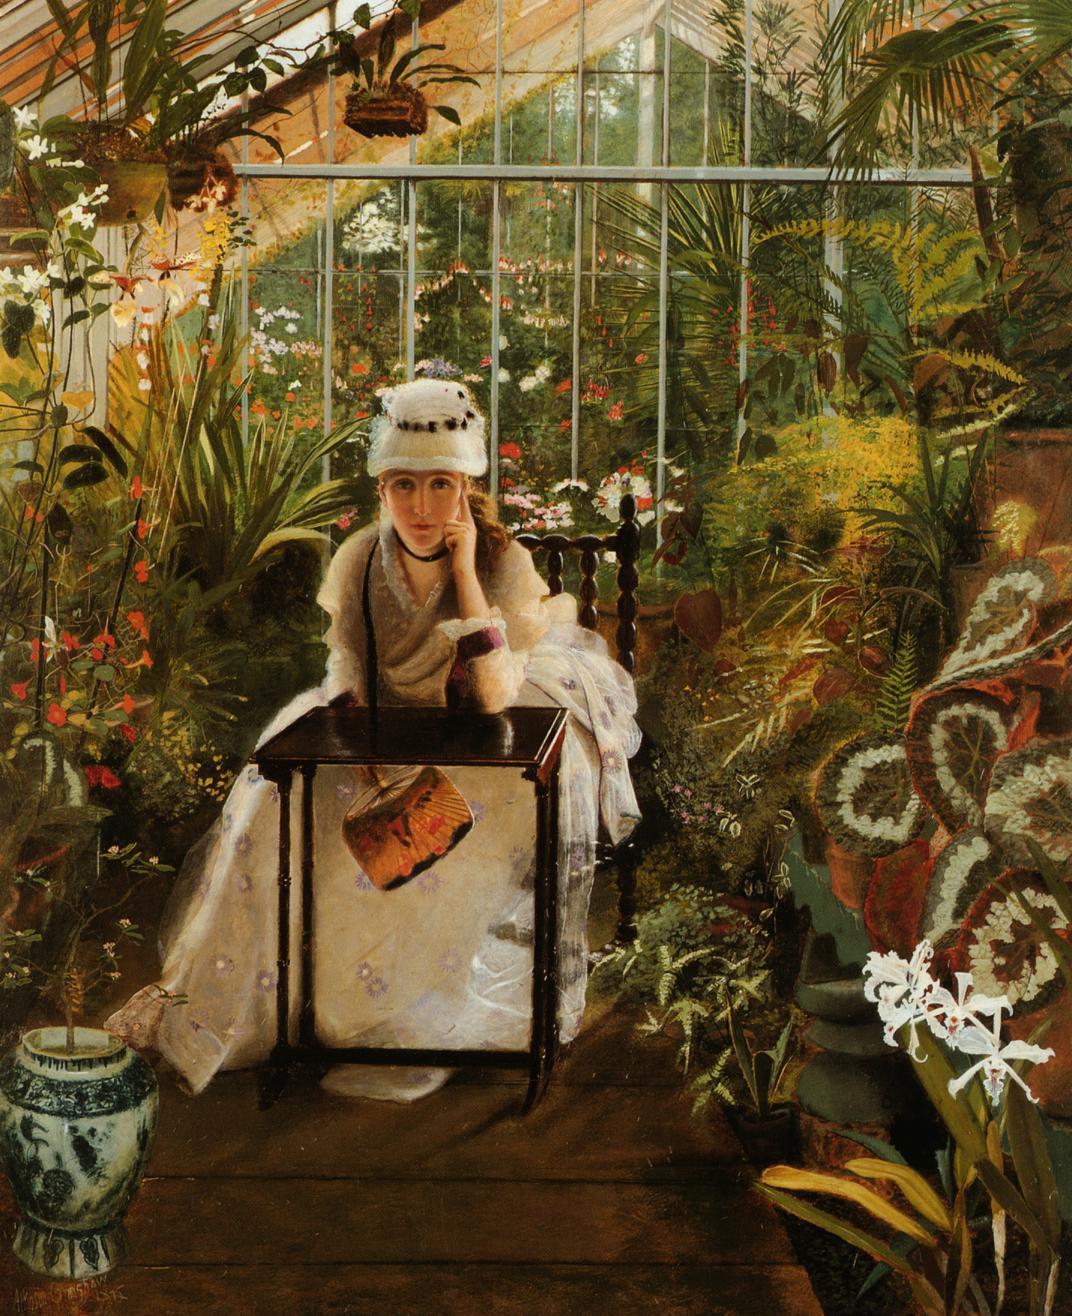 John Atkinson Grimshaw. Portrait of Fanny Grimshaw, the artist's wife